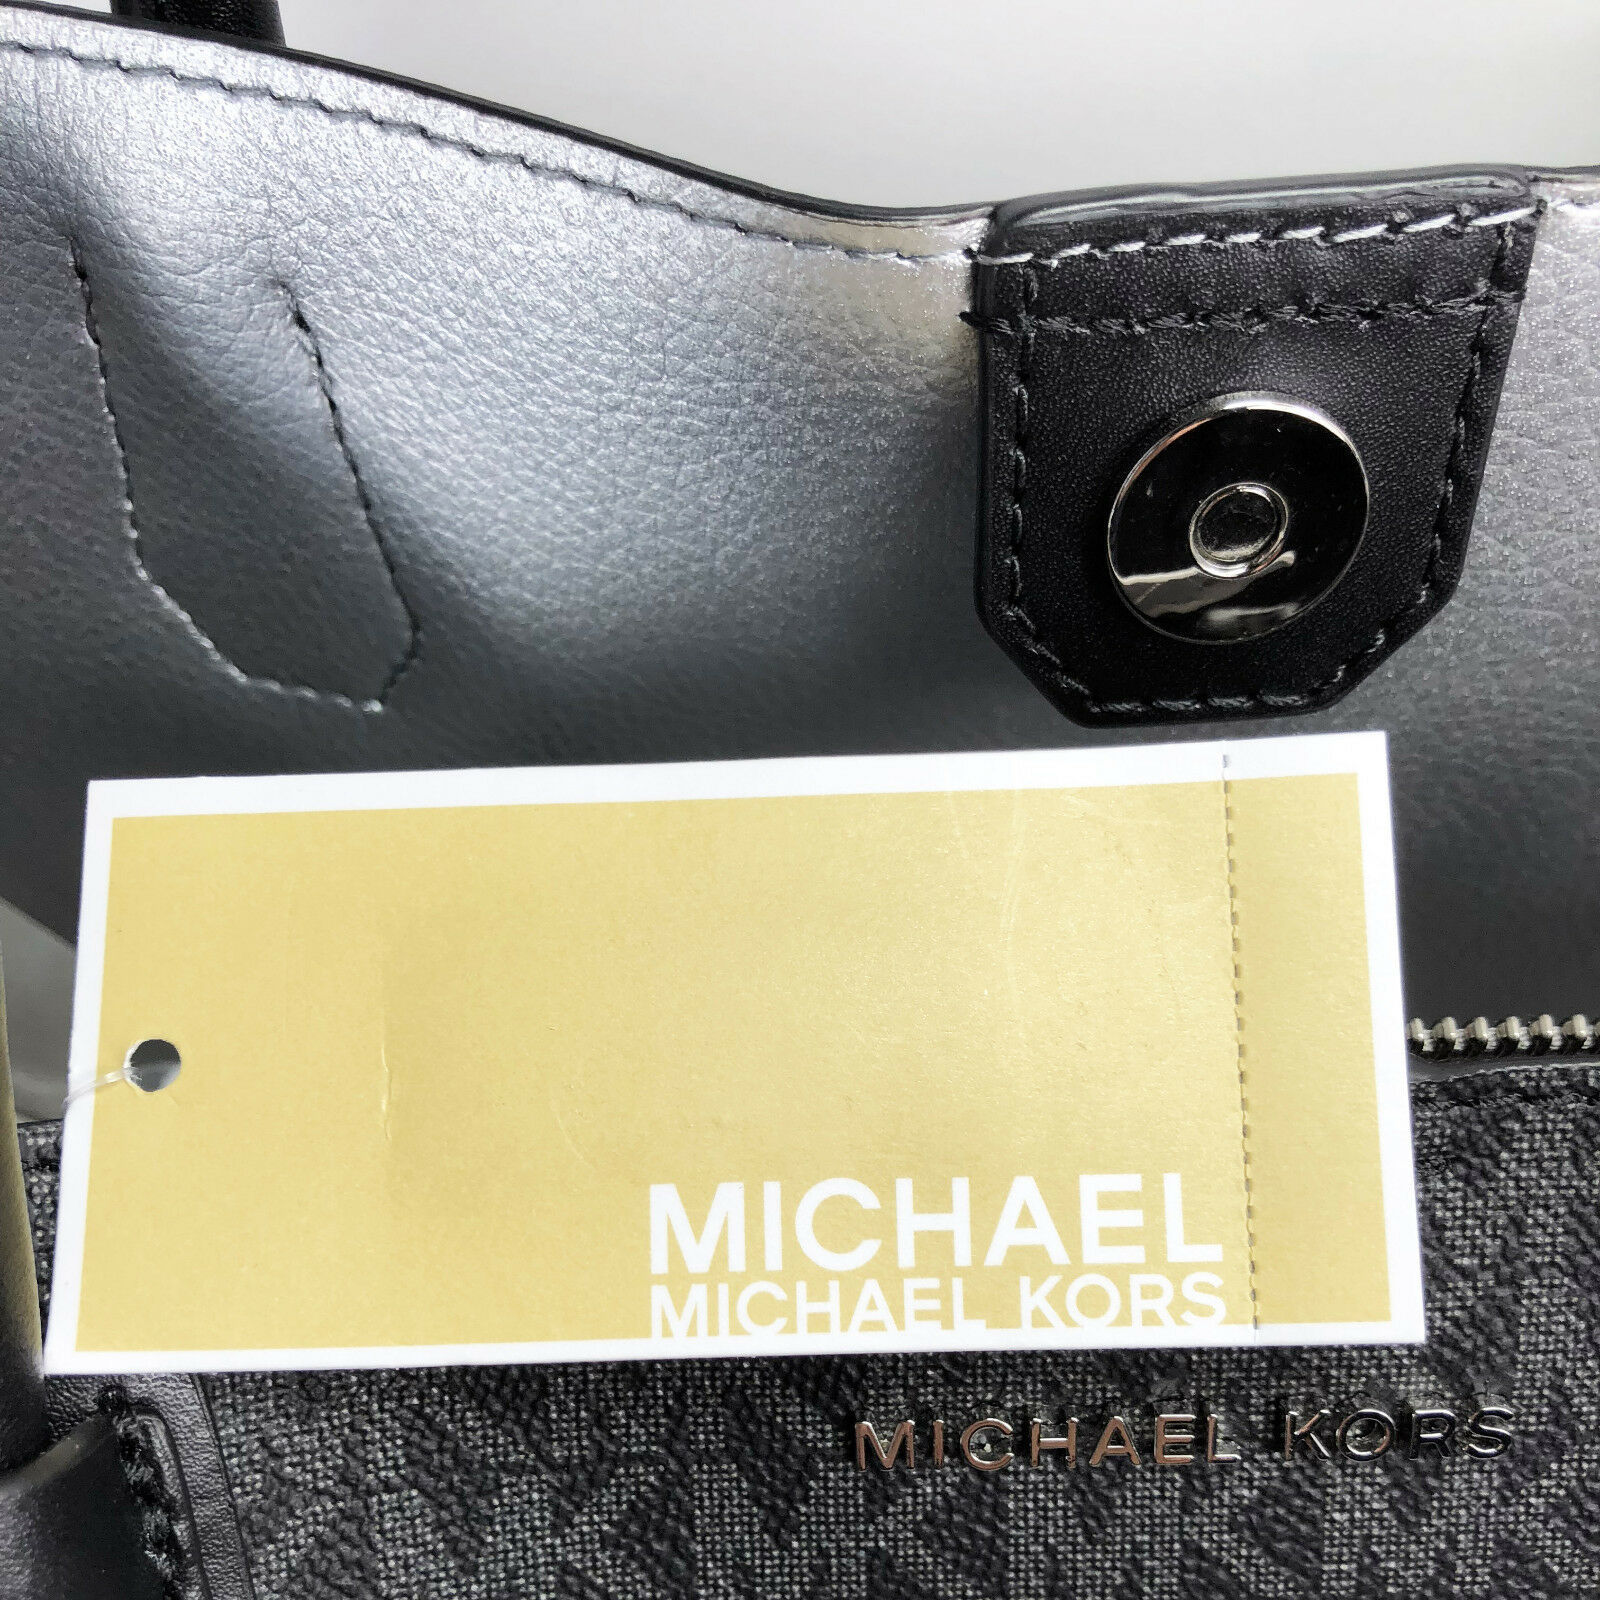 Michael Kors Mercer Corner LG Center Zip Signature Tote Convertable Black Pewter